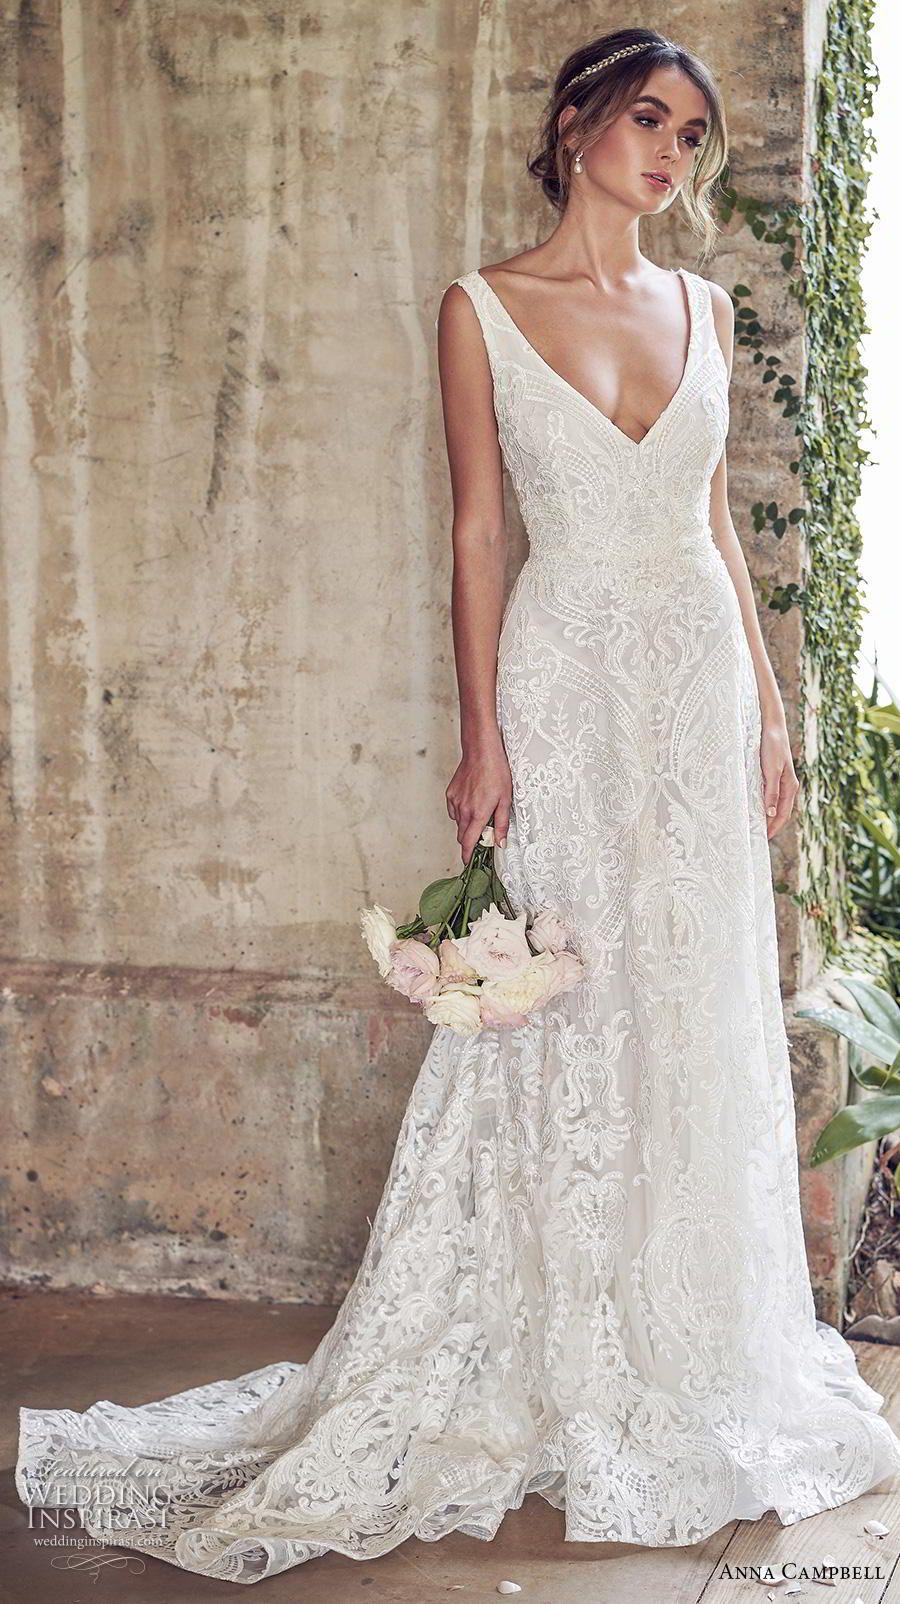 f50830fe76bb2 anna campbell 2019 bridal sleeveless v neck full embellishment elegant  romantic a line wedding dress backless medium train (14) mv -- Anna  Campbell 2019 ...